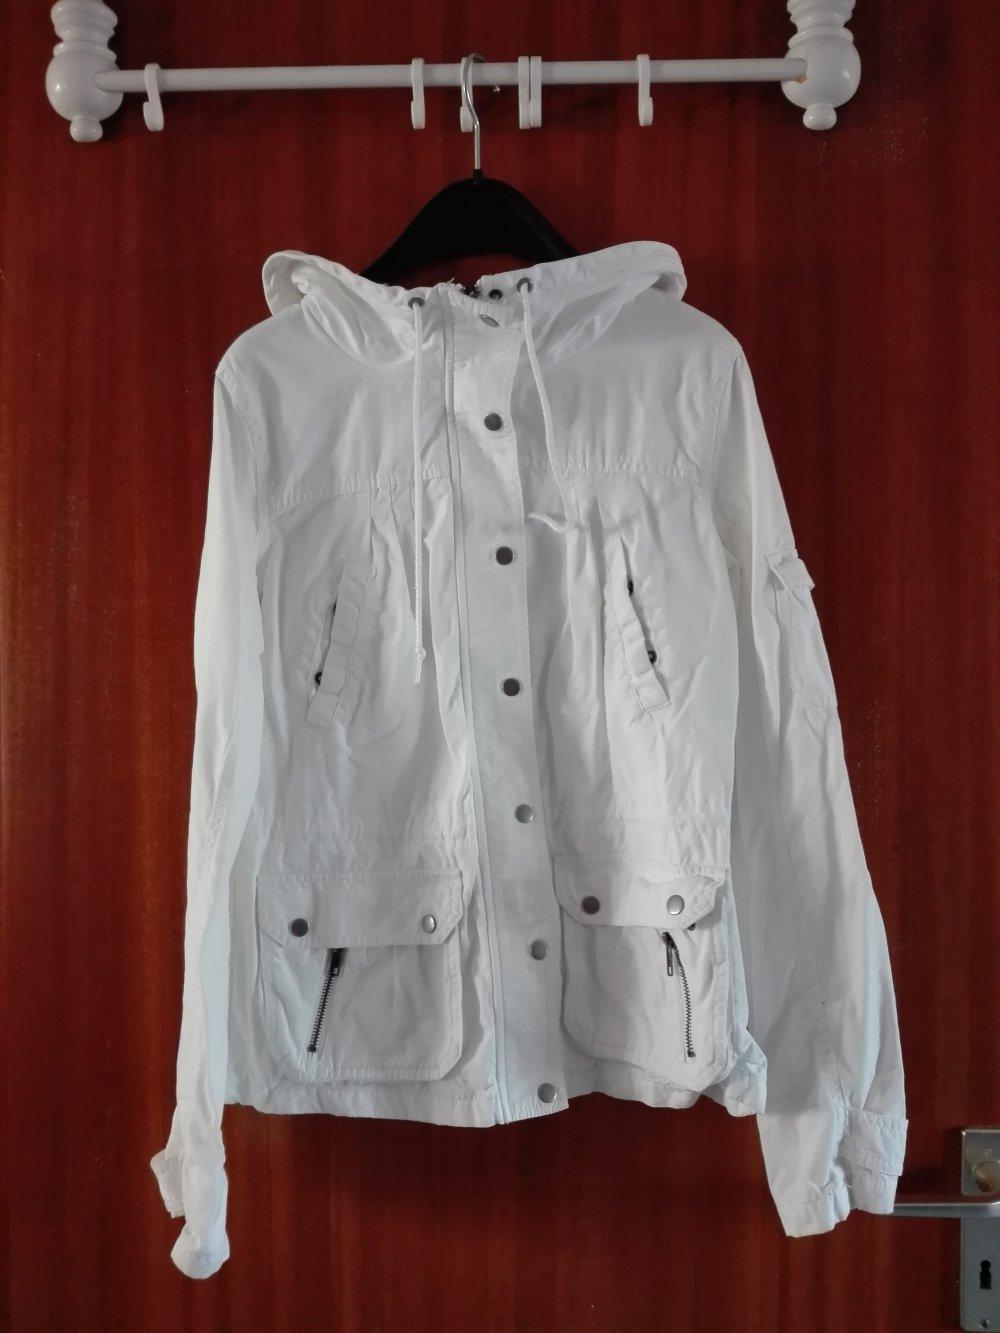 57acd428400885 Weiße Sommerjacke 40 H&M :: Kleiderkorb.de